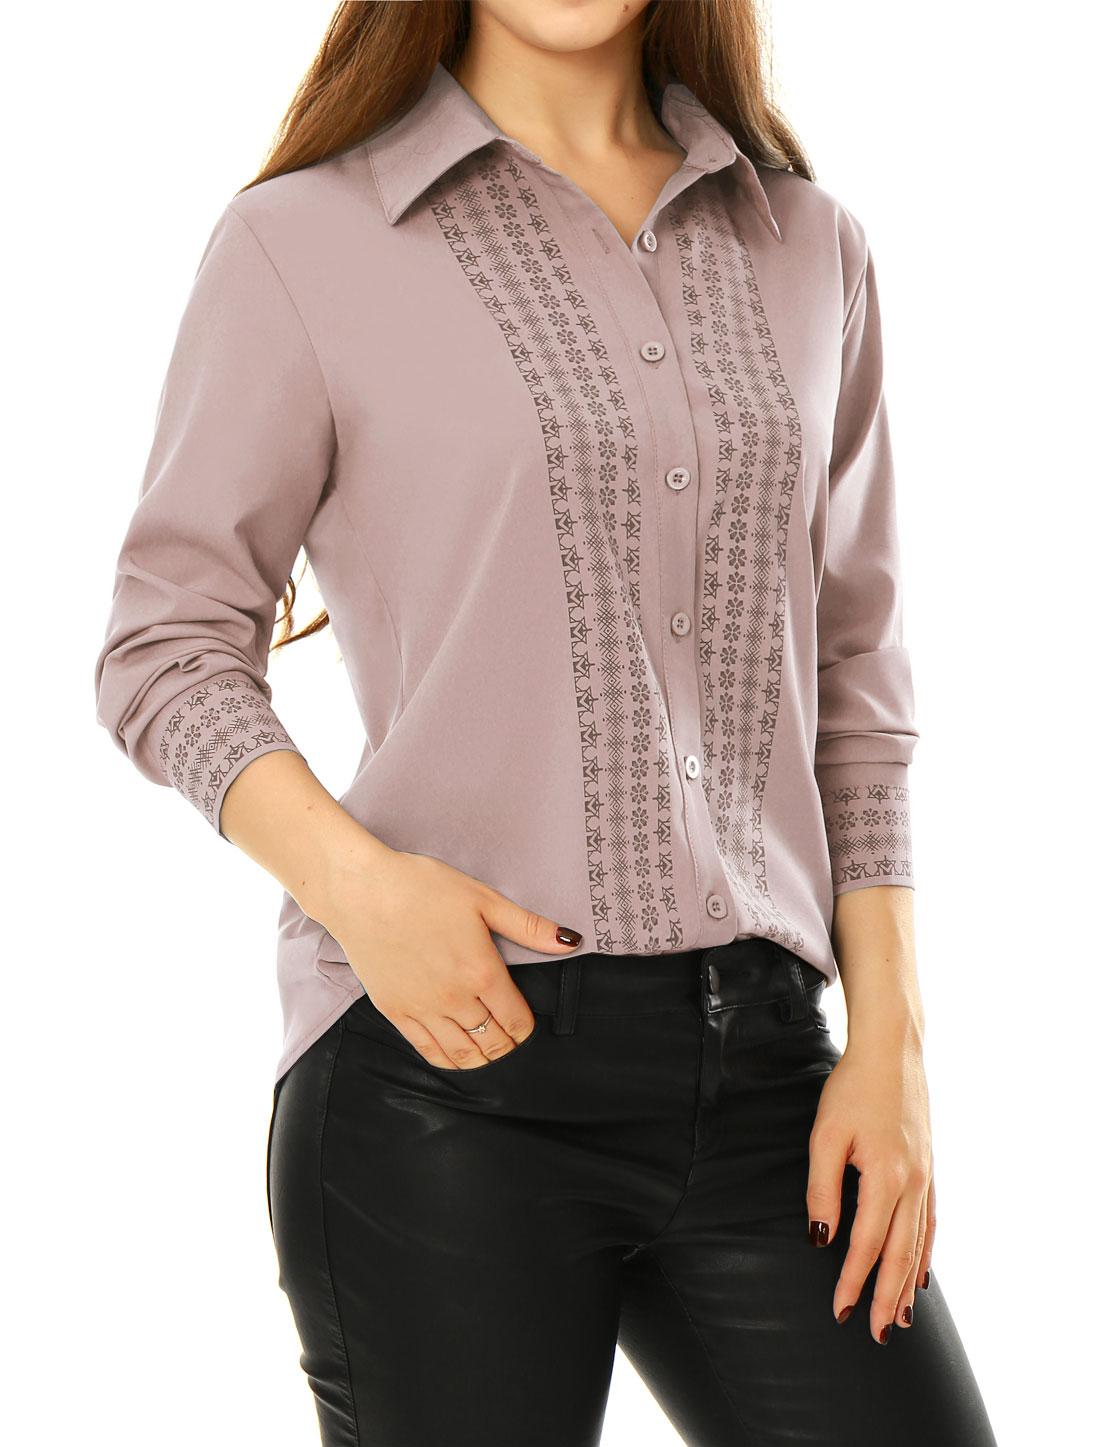 Women Tile Print Long Sleeves Buttoned Tunic Shirt Pink S